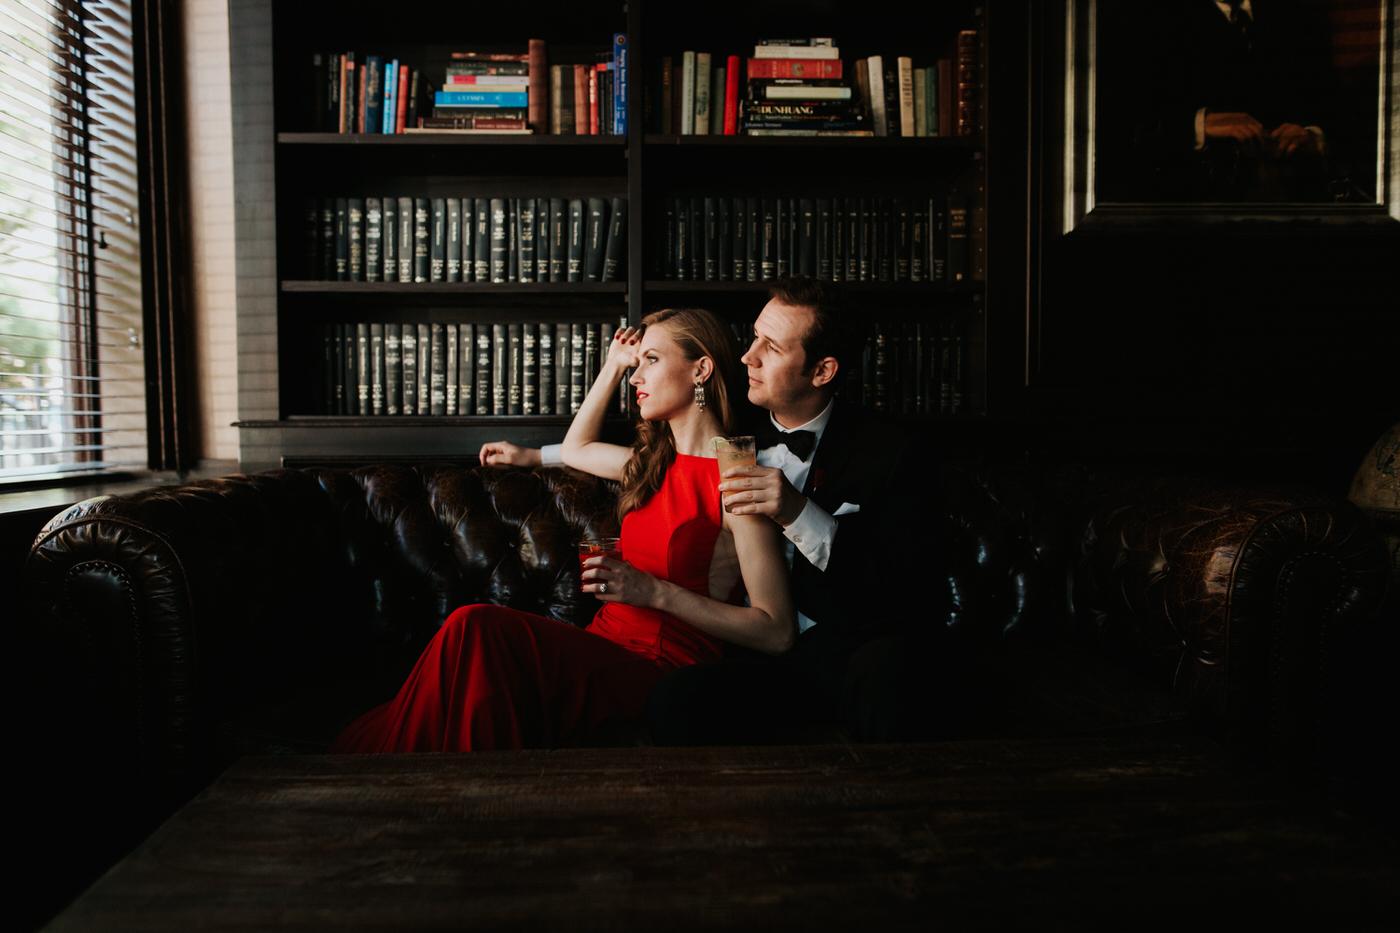 Union Hall Park Slope Engagement - Diana Ascarrrunz Photography -173.jpg